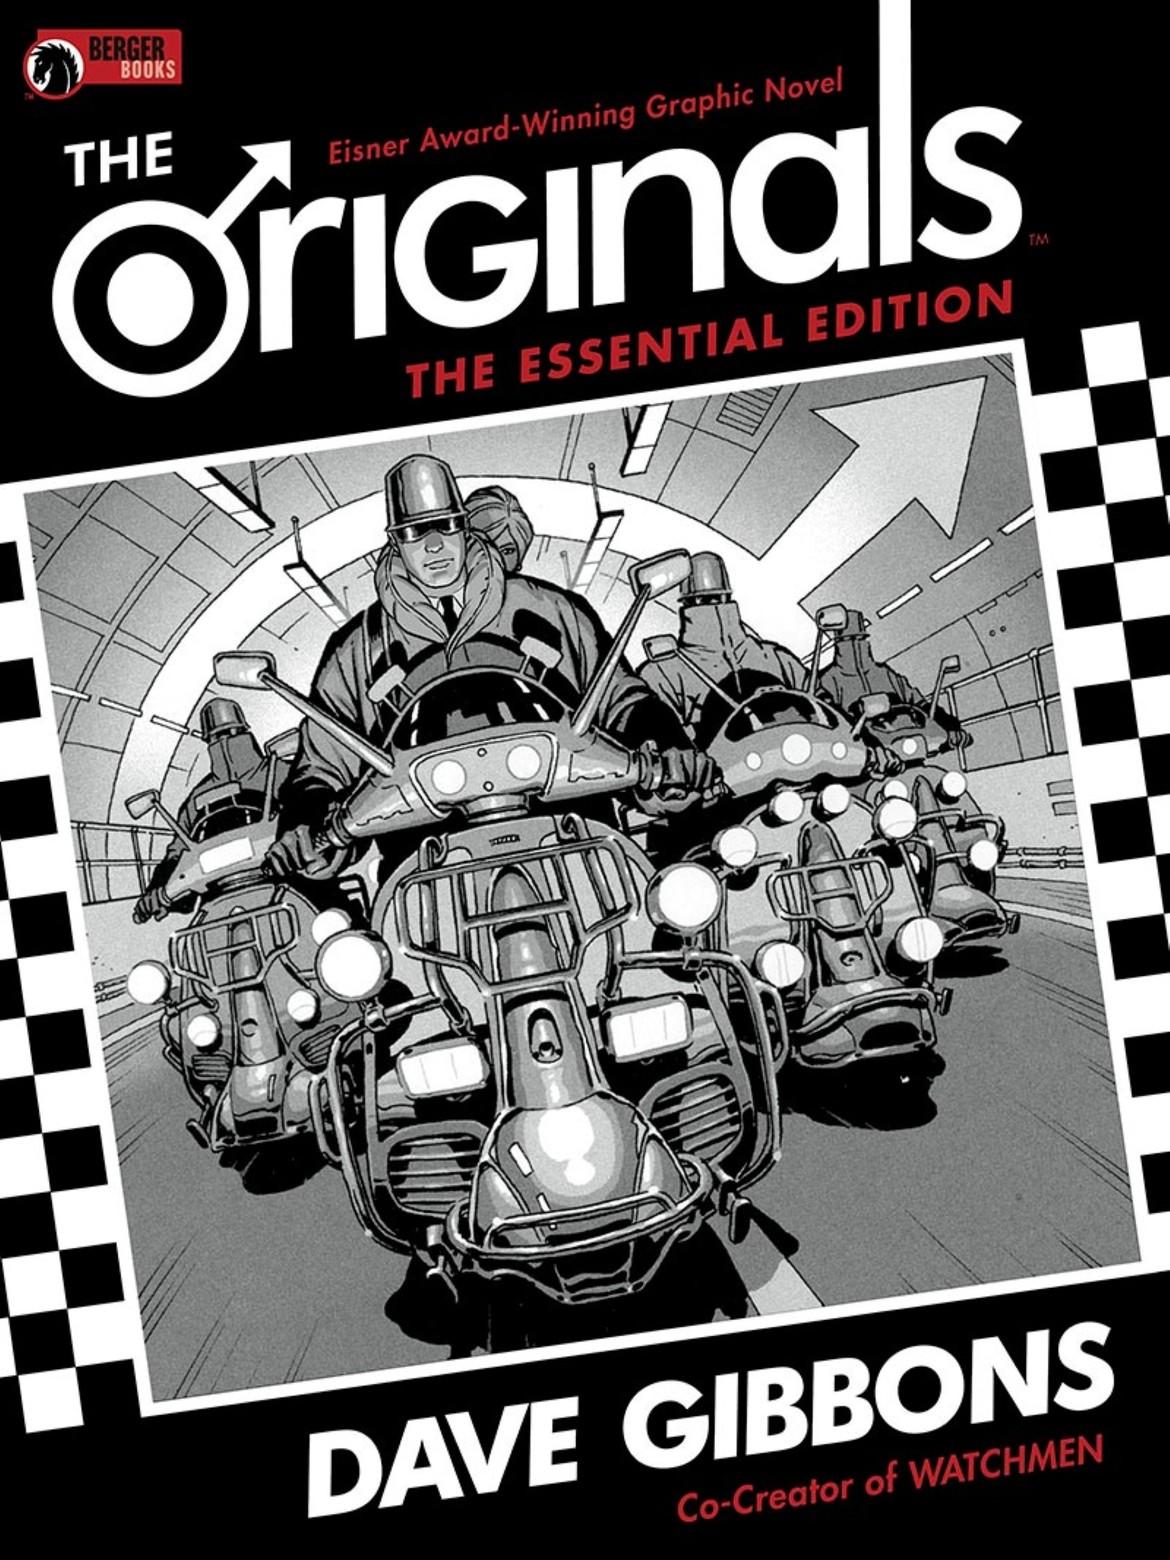 the originals (Custom).jpg